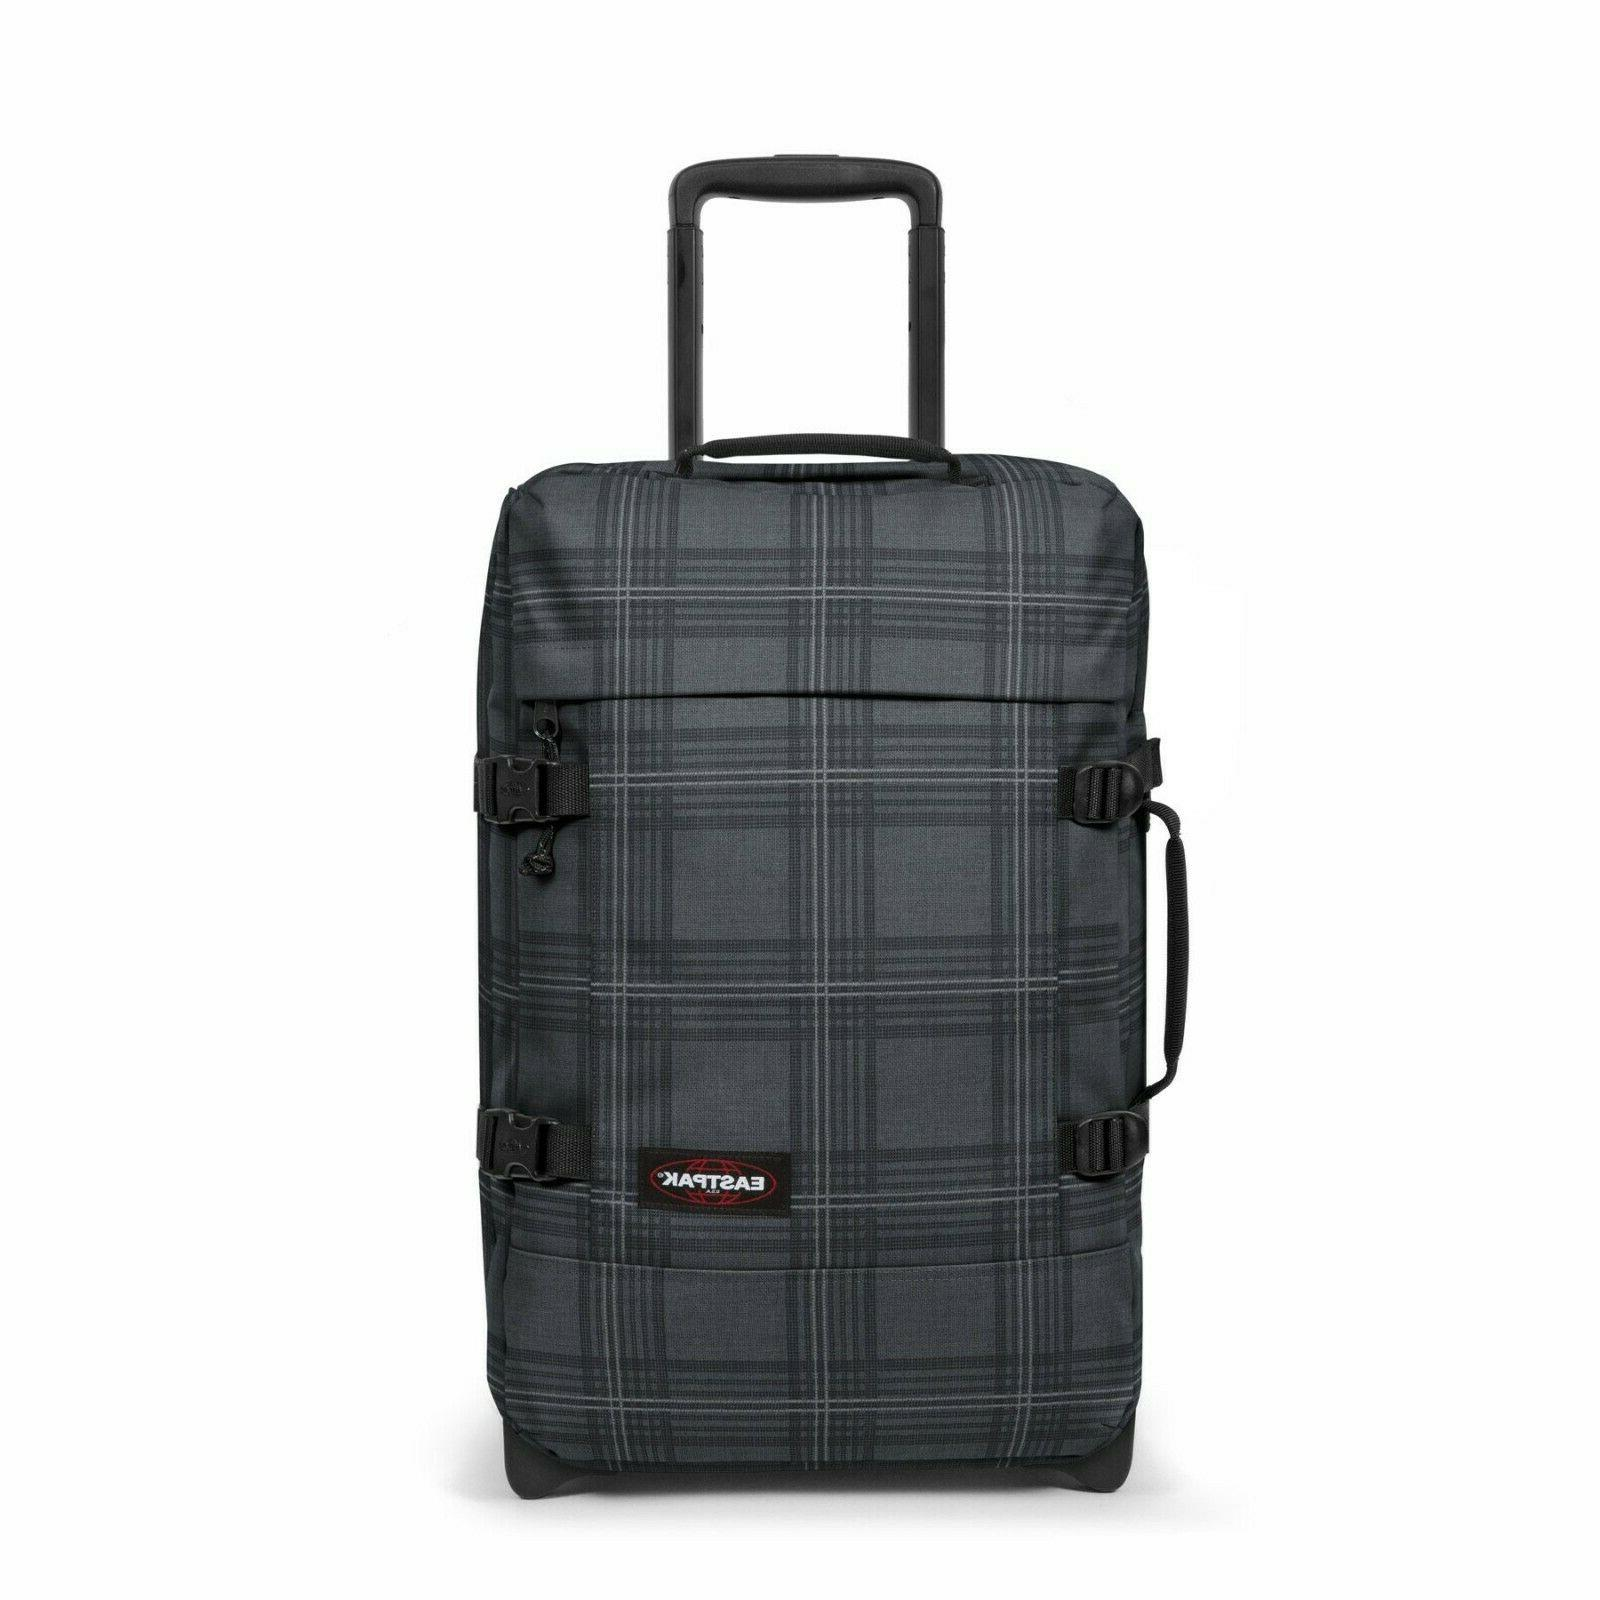 trolley suitcase women s man unisex fabric